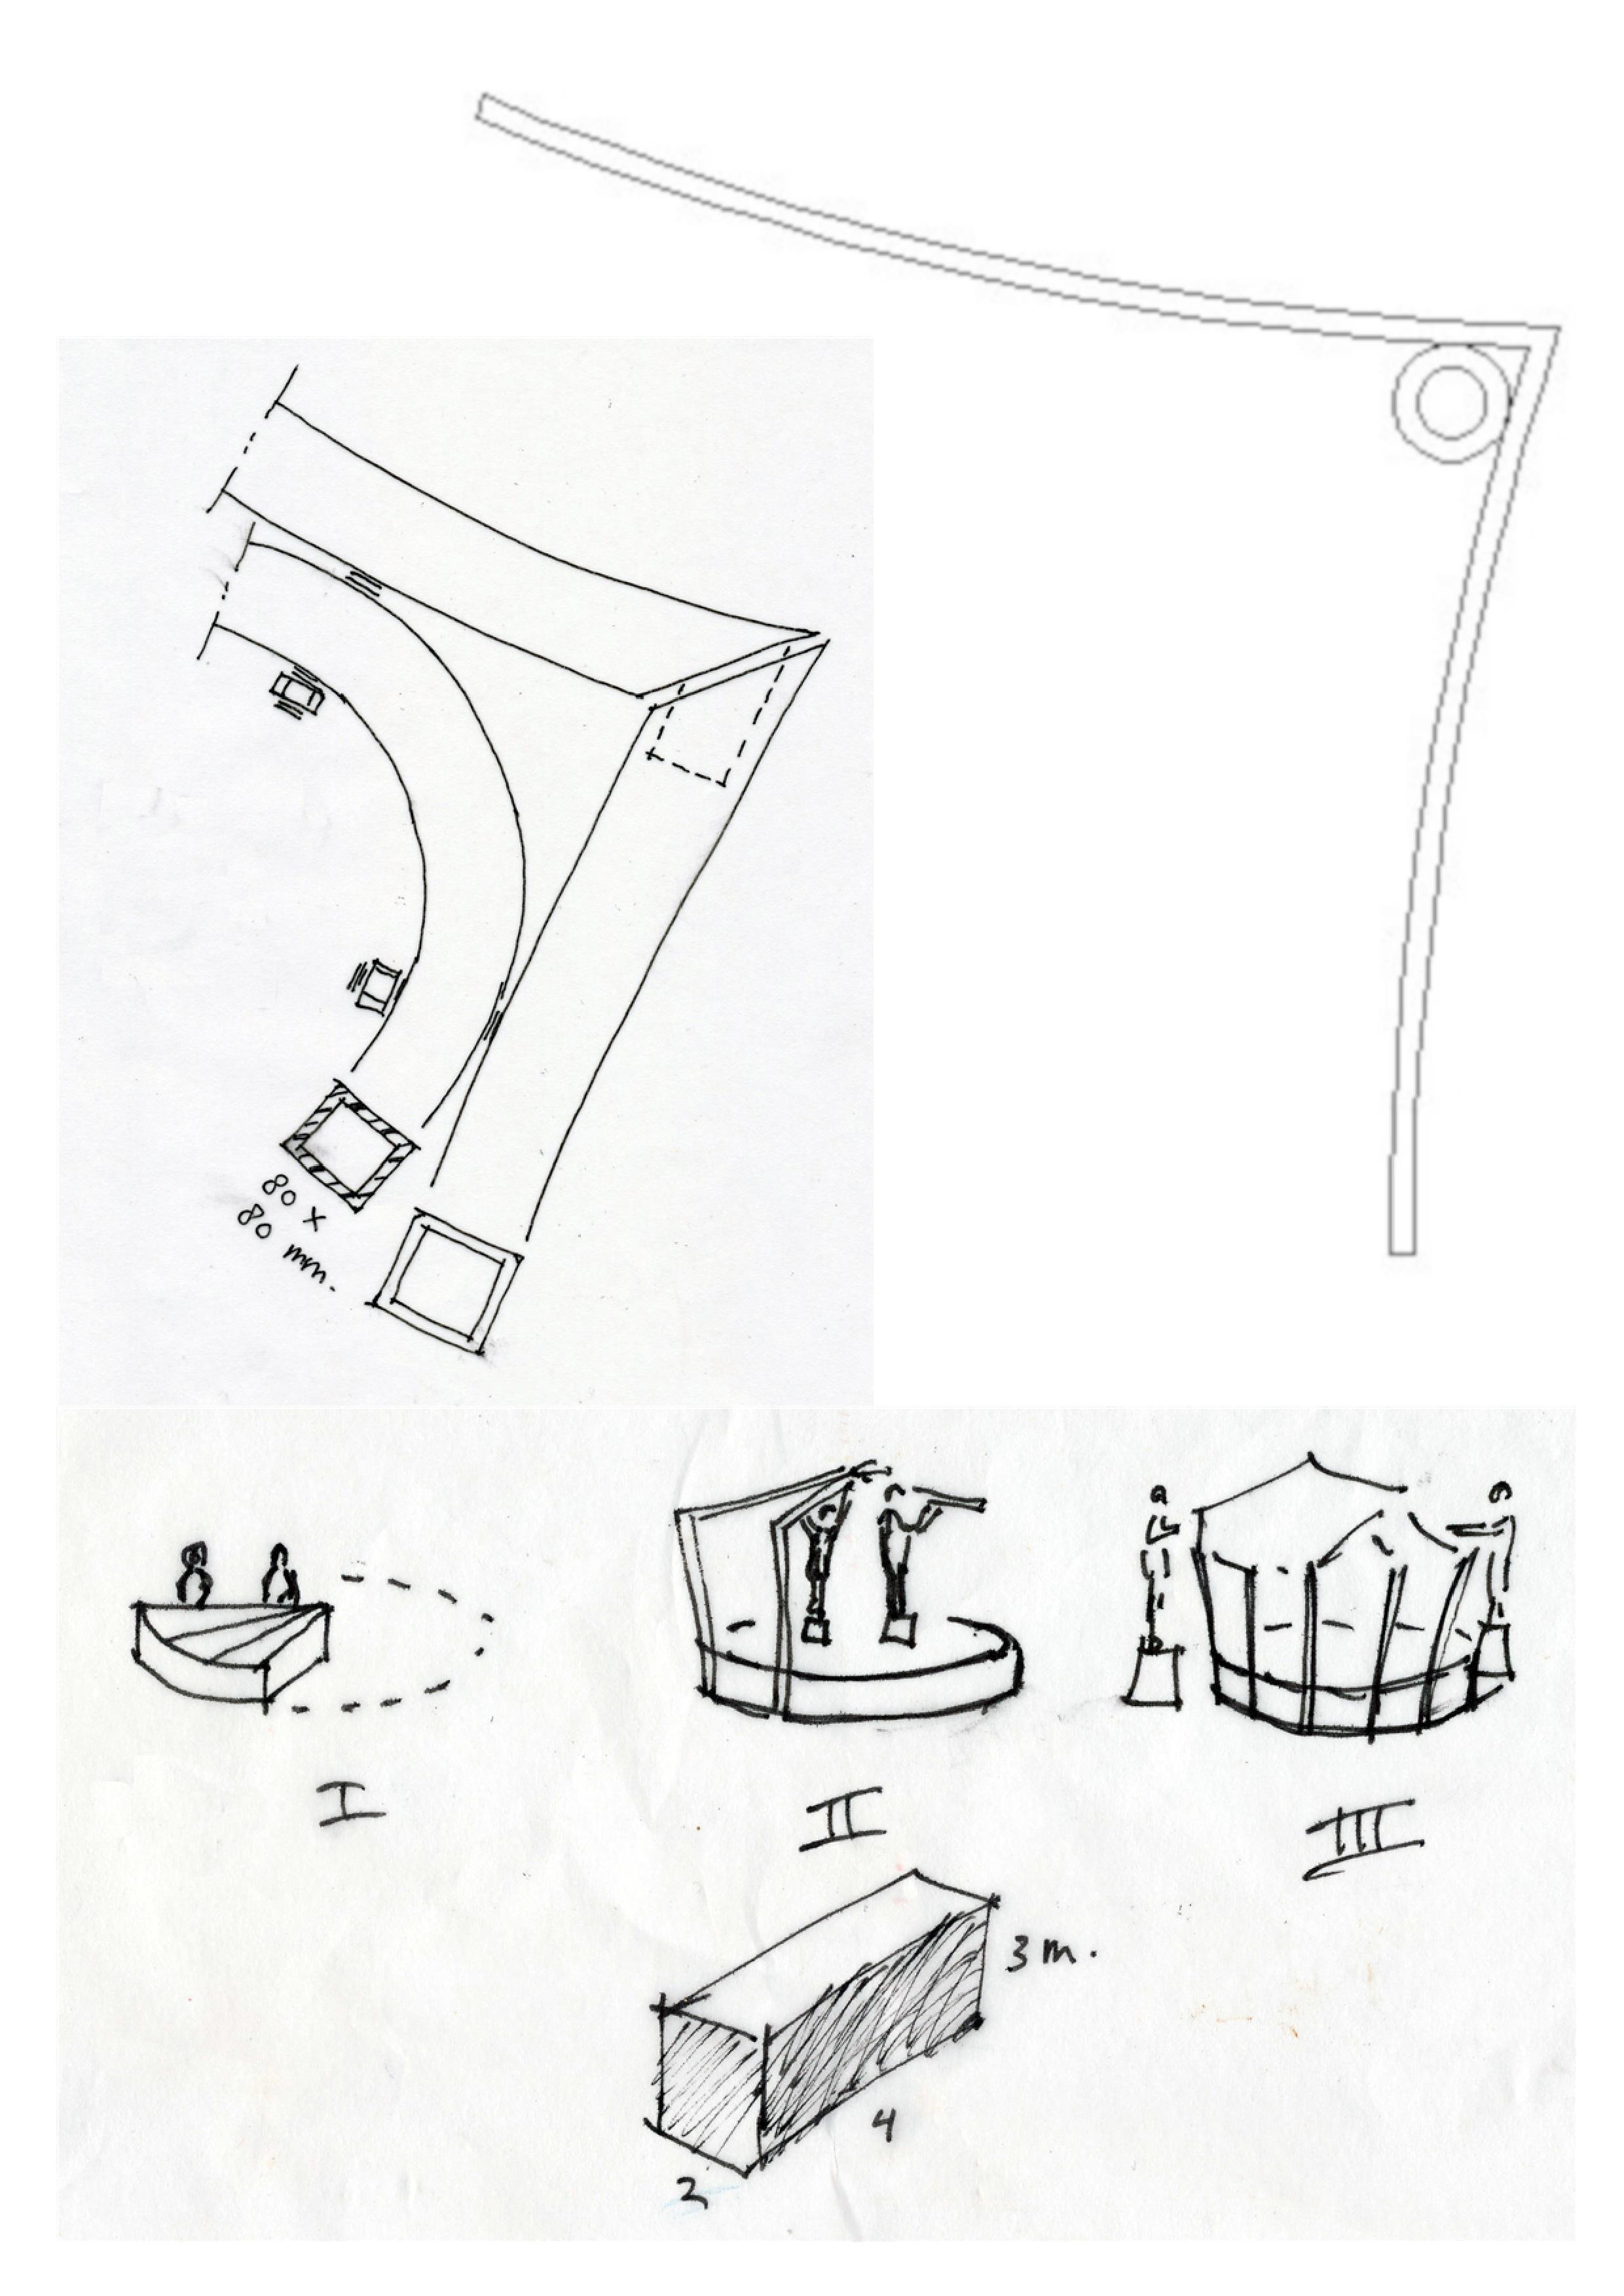 <p>spidermuscica-10of10-details-erection</p>